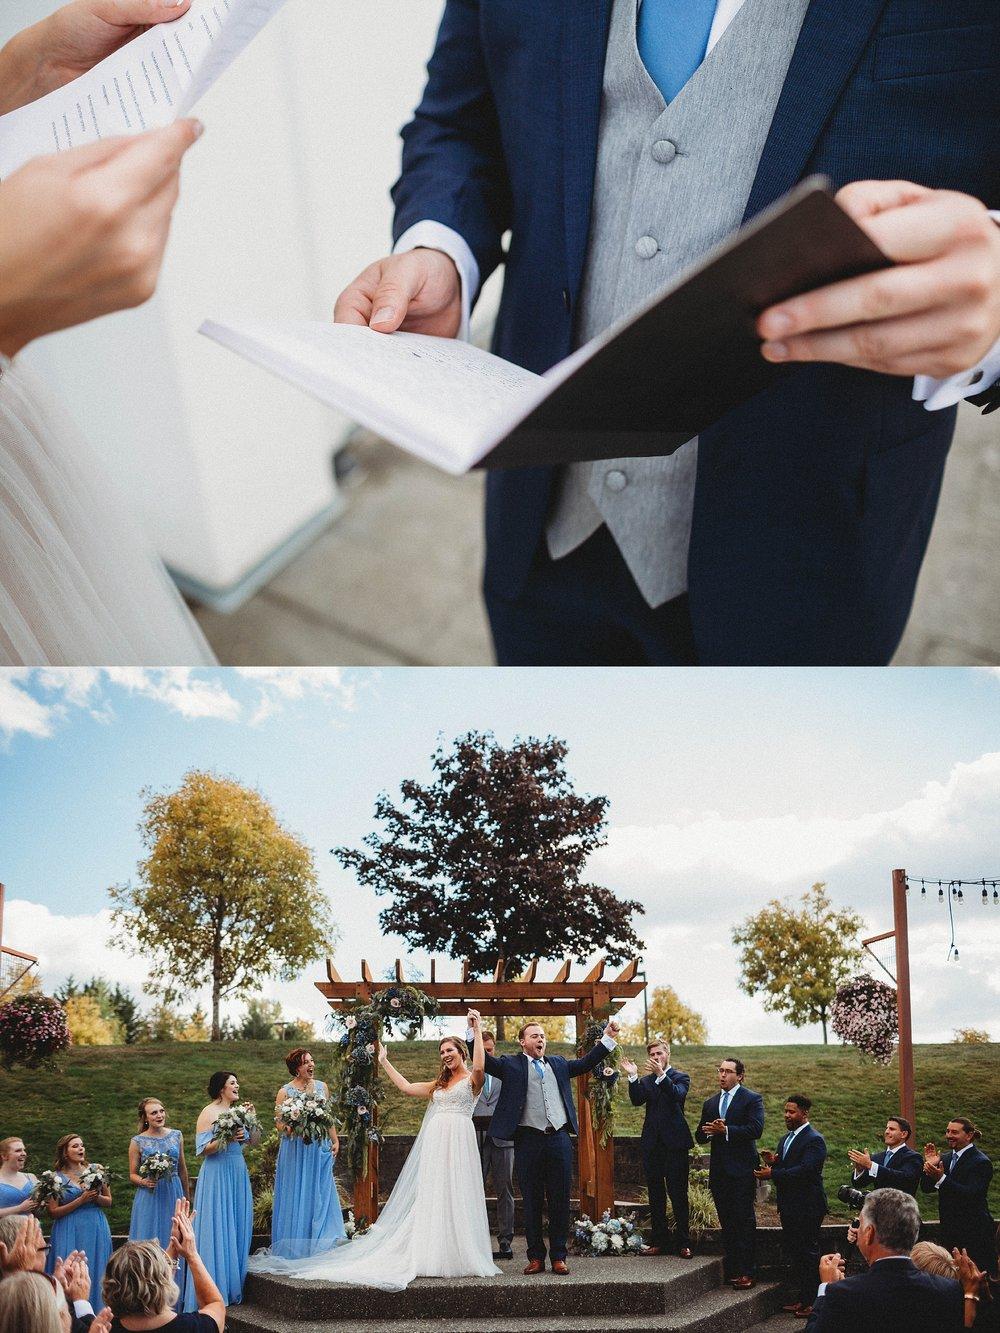 olson mansion wedding photography - jill and garrett - ashley vos photography - seattle area wedding photographer-30.jpg